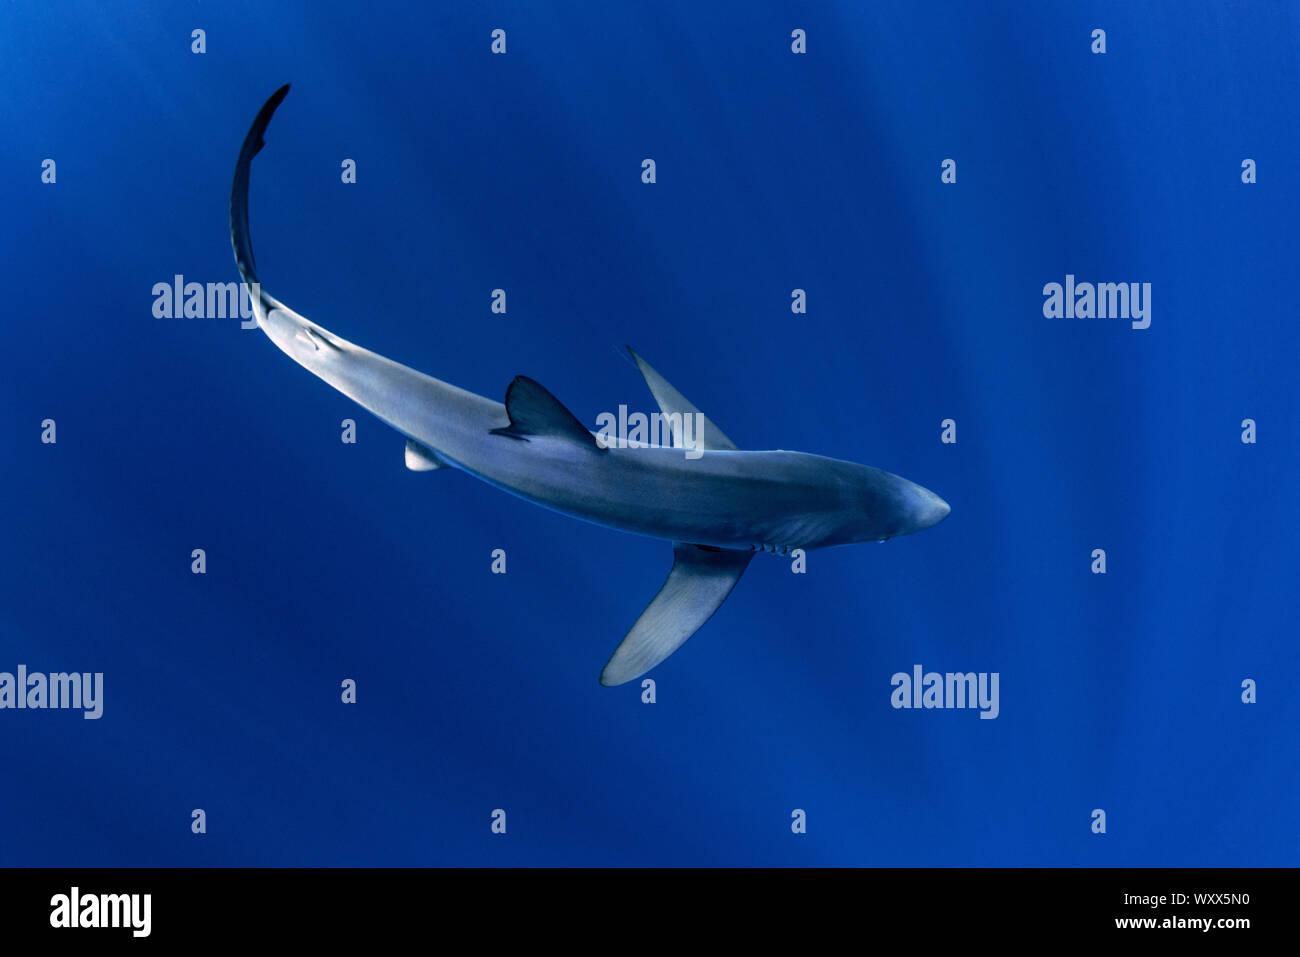 Blue shark (Prionace glauca). North Atlantic Ocean, Canary Islands. Stock Photo